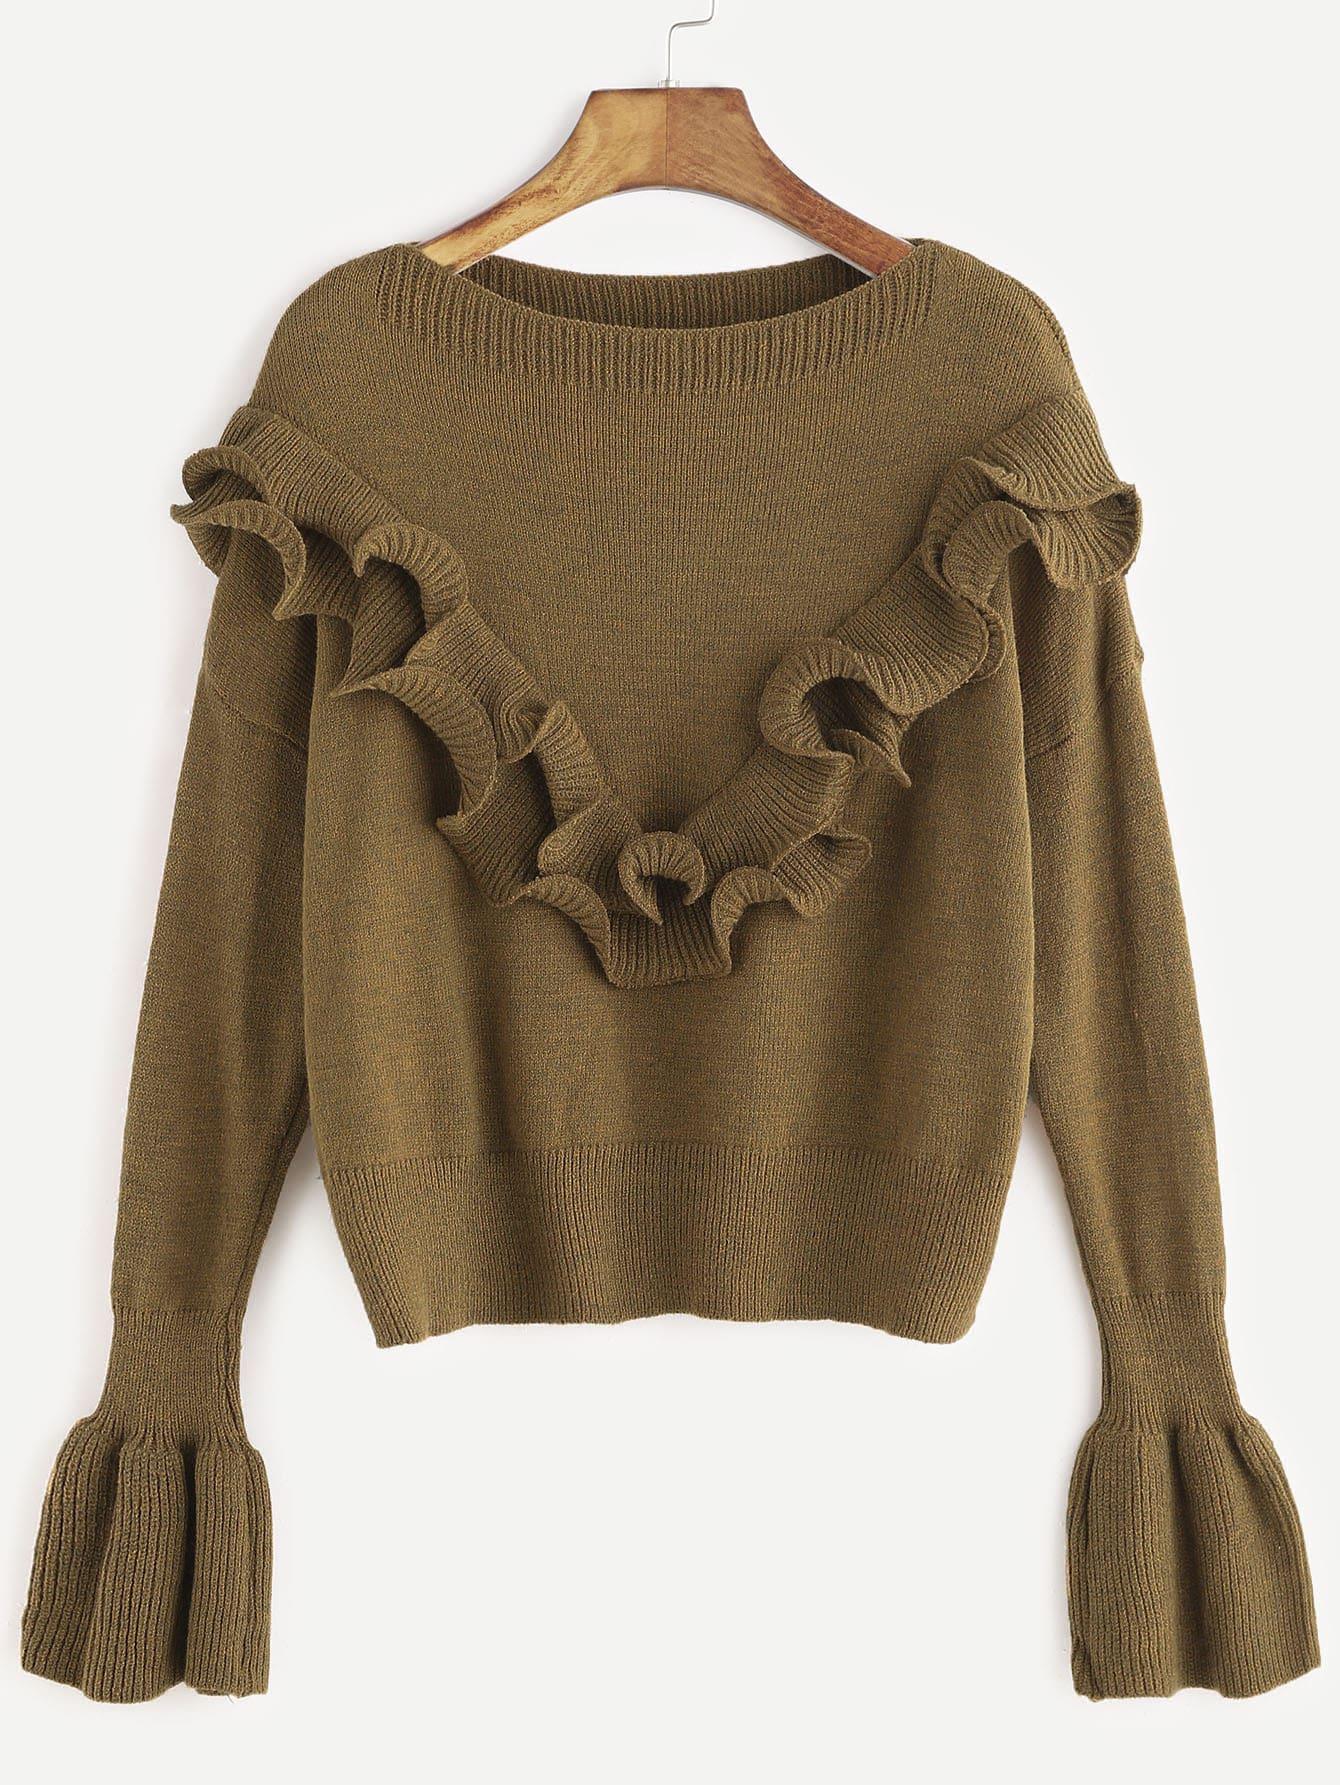 Khaki Drop Shoulder Bell Sleeve Ruffle Trim Sweater sweater161121103